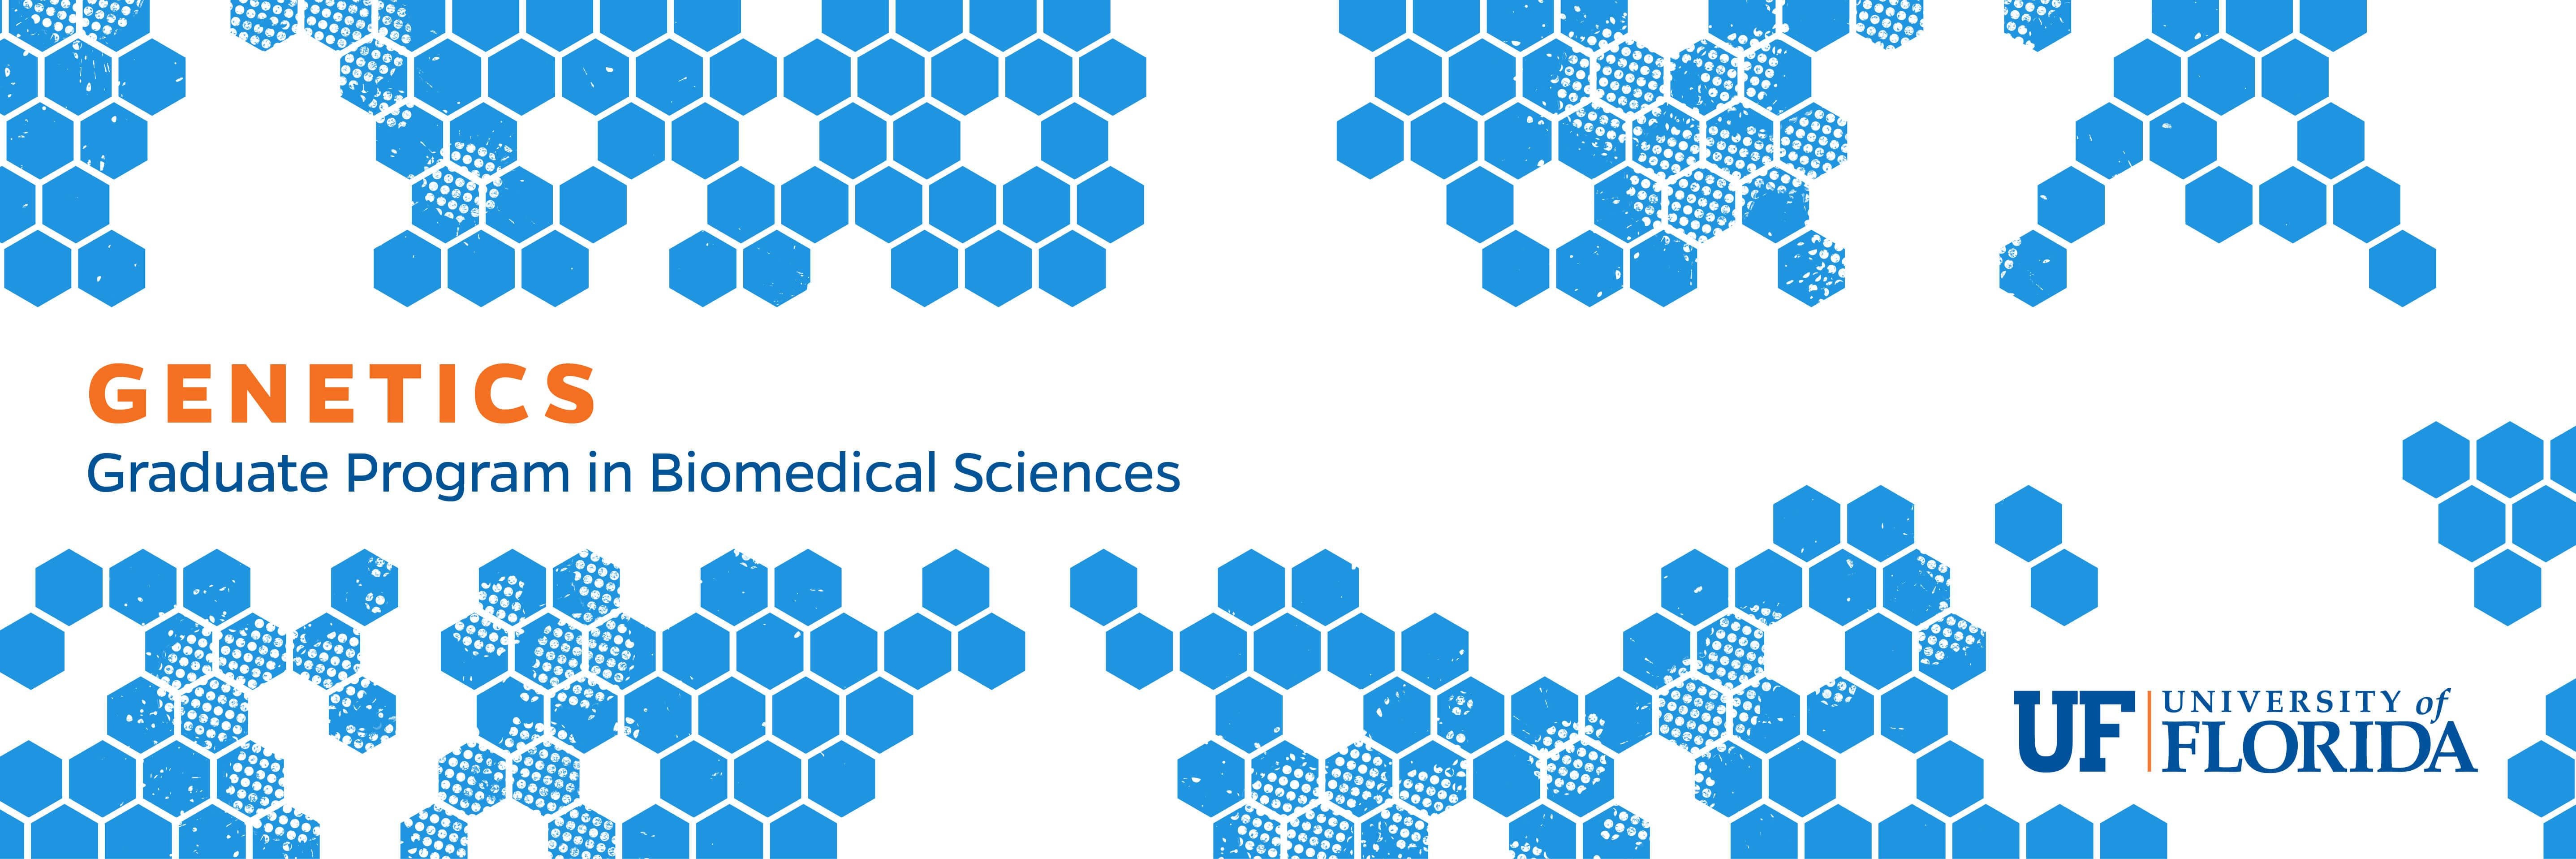 Genetics Concentration Graduate Program In Biomedical